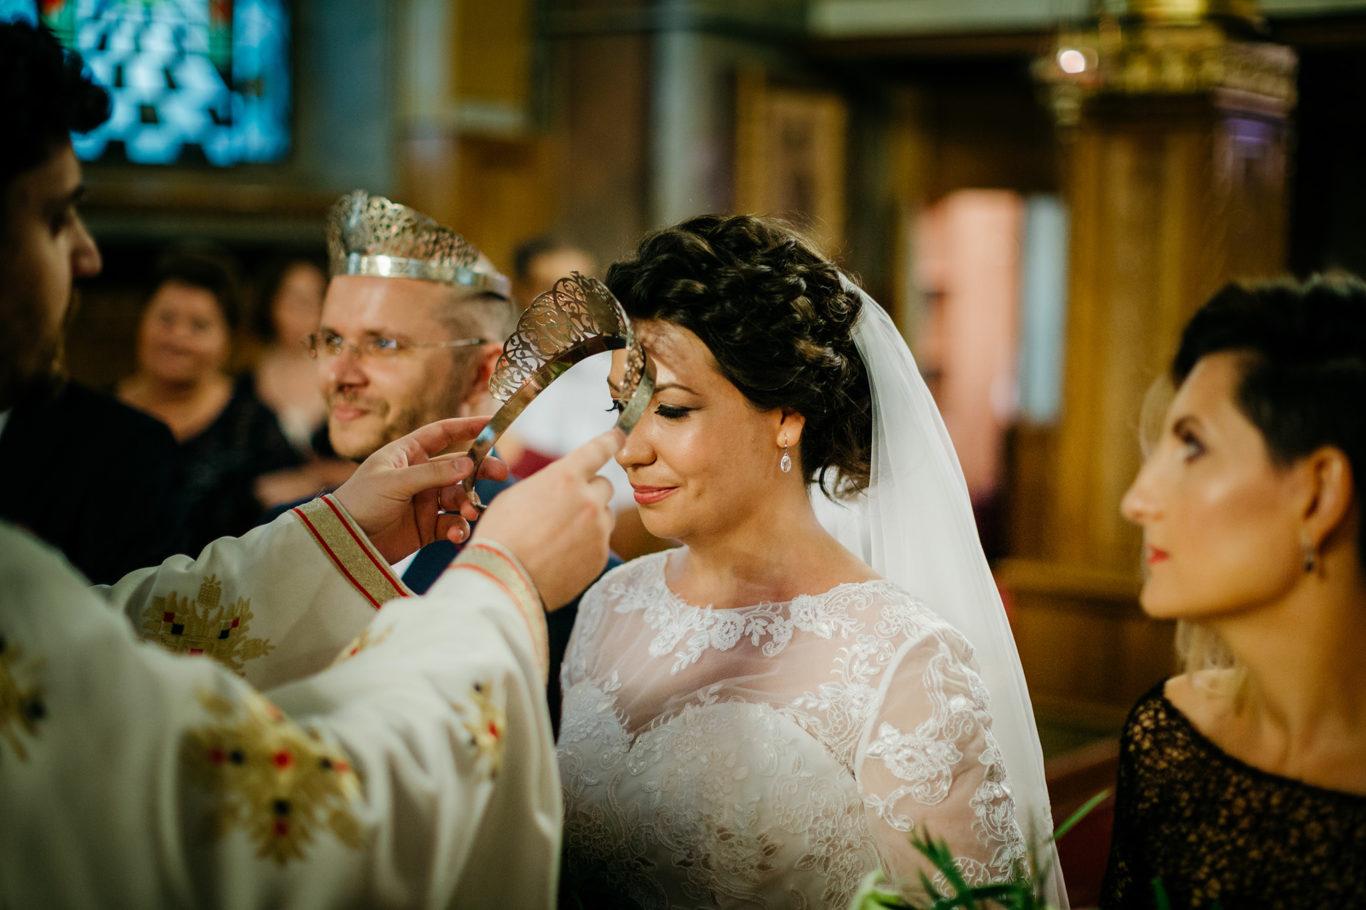 0399-fotografie-nunta-bucuresti-anca-george-fotograf-ciprian-dumitrescu-dcf_4949